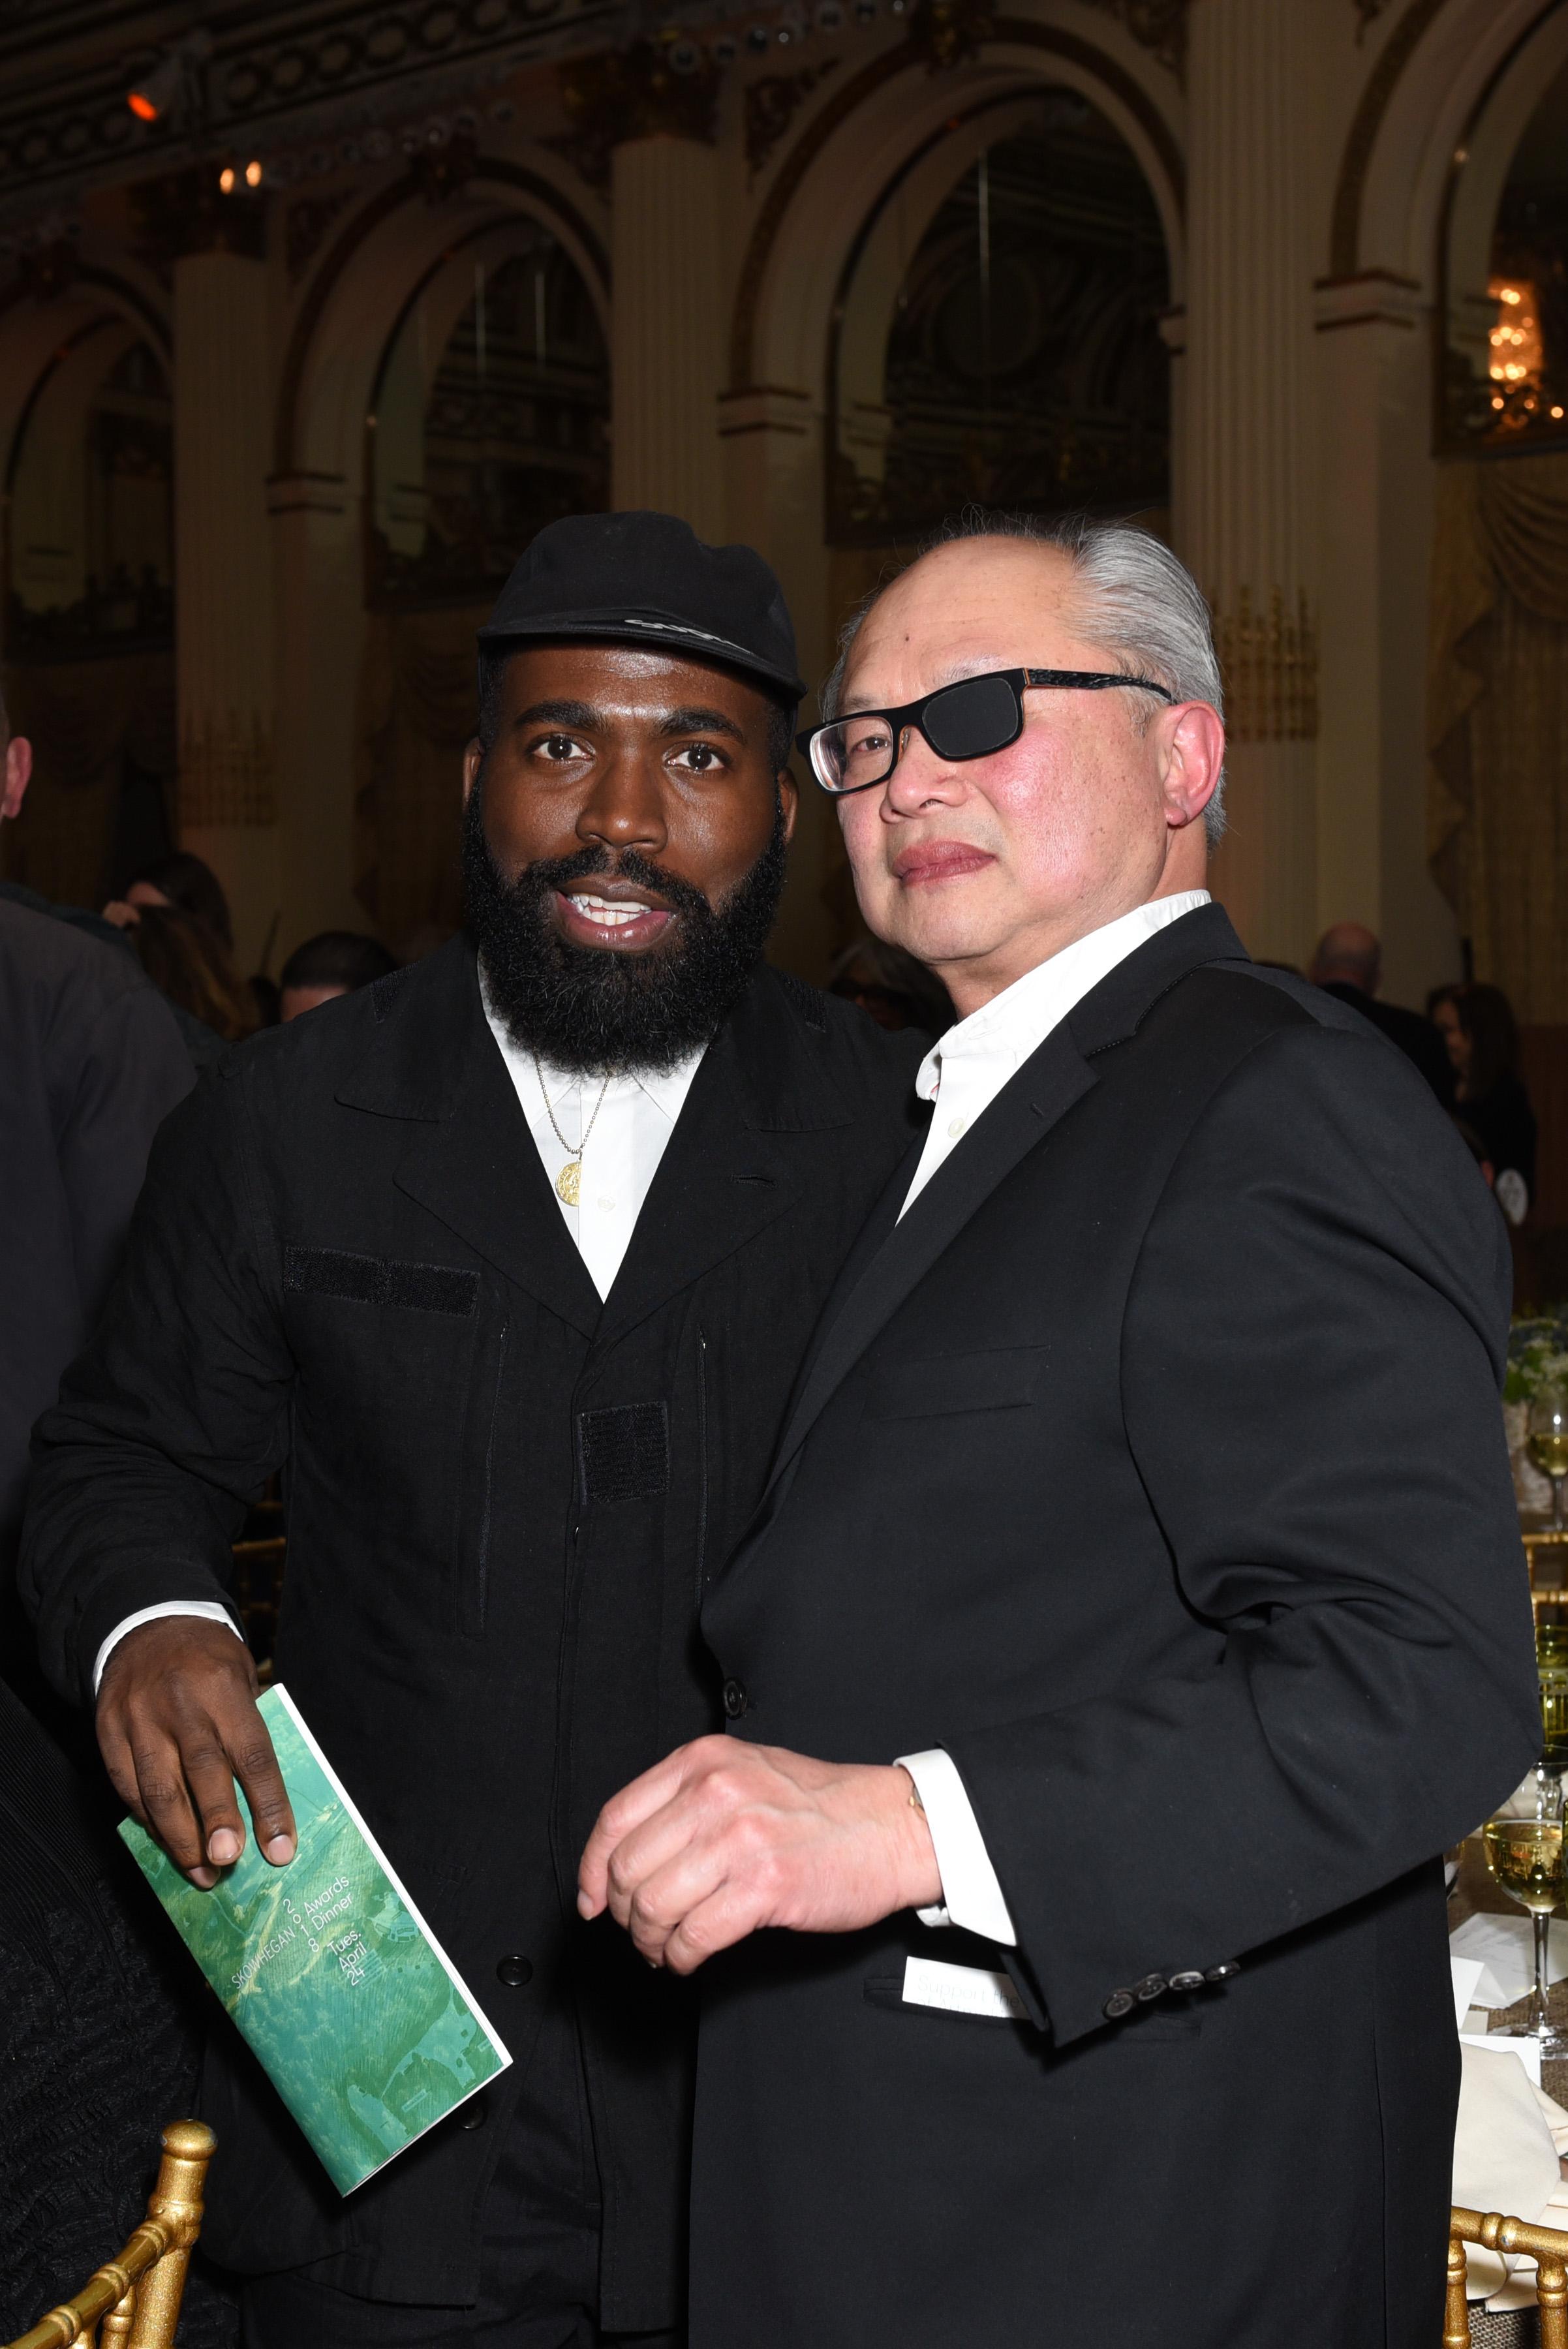 Derrick Adams, ?==Skowhegan Awards Dinner 2018==The Plaza Hotel, New York, NY==April 24, 2018==�Patrick McMullan==Photo - Presley Ann/PMC====